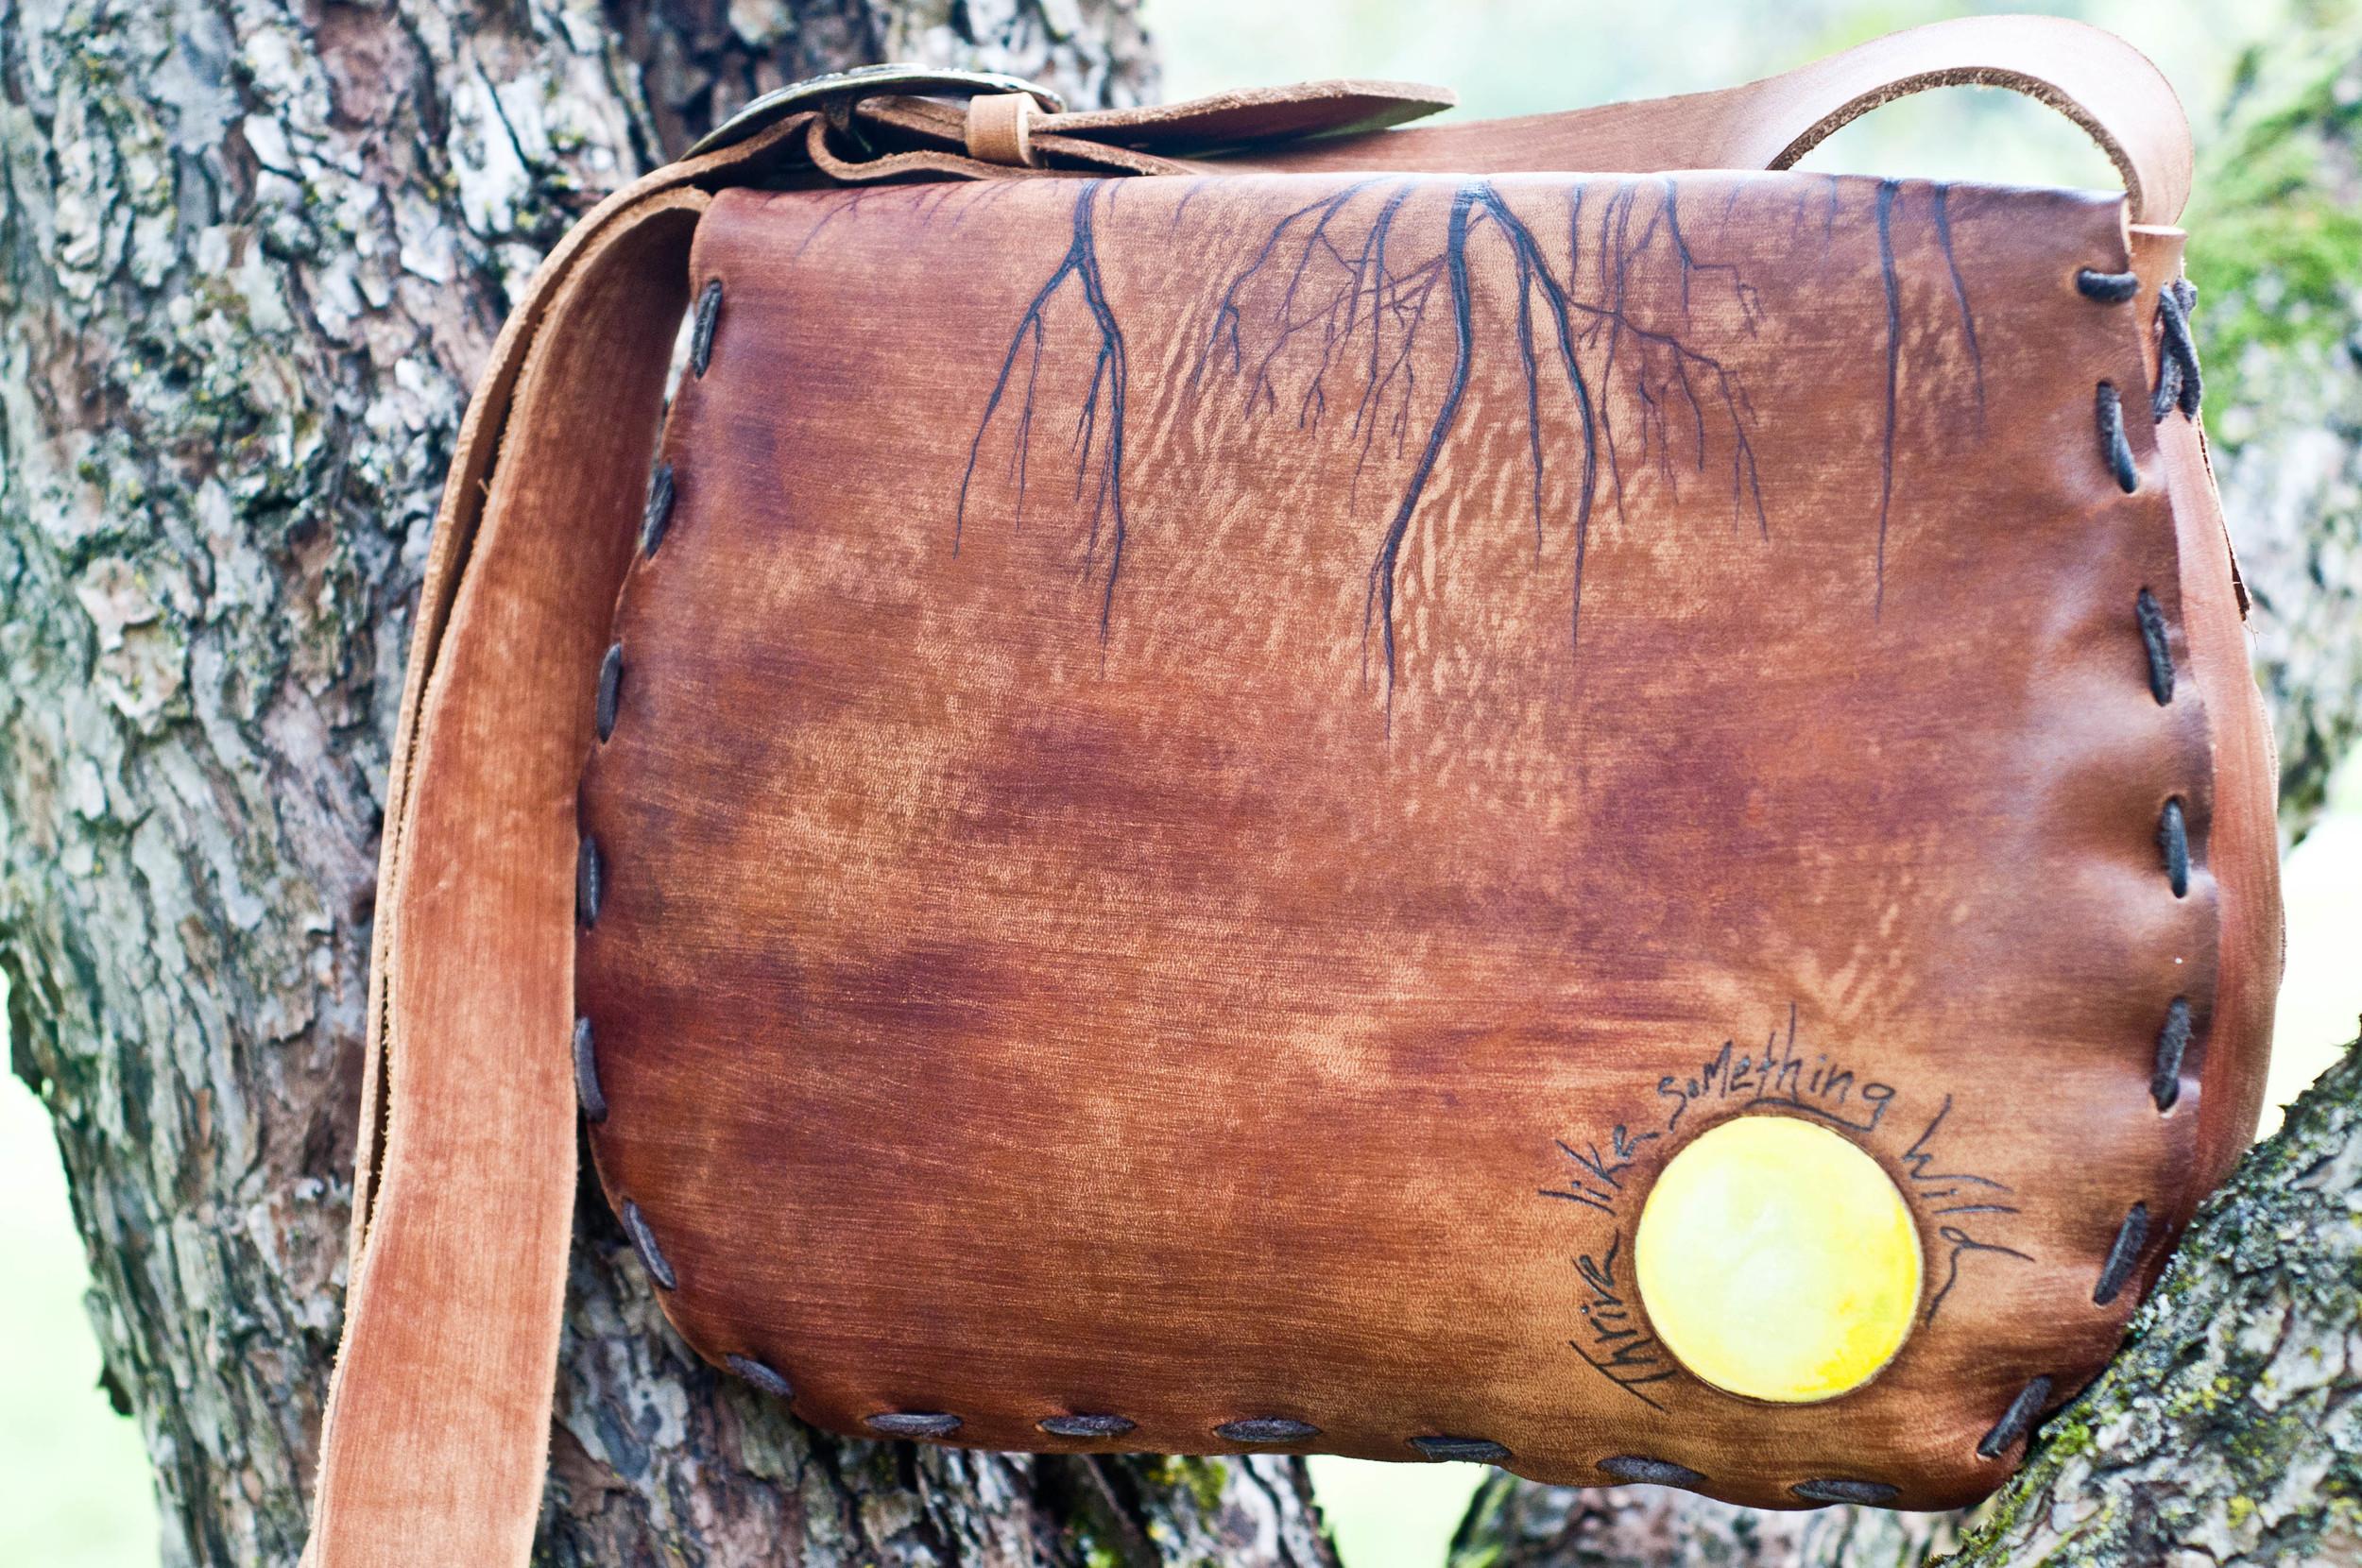 thrive-like-something-wild-leather-bag-6.jpg